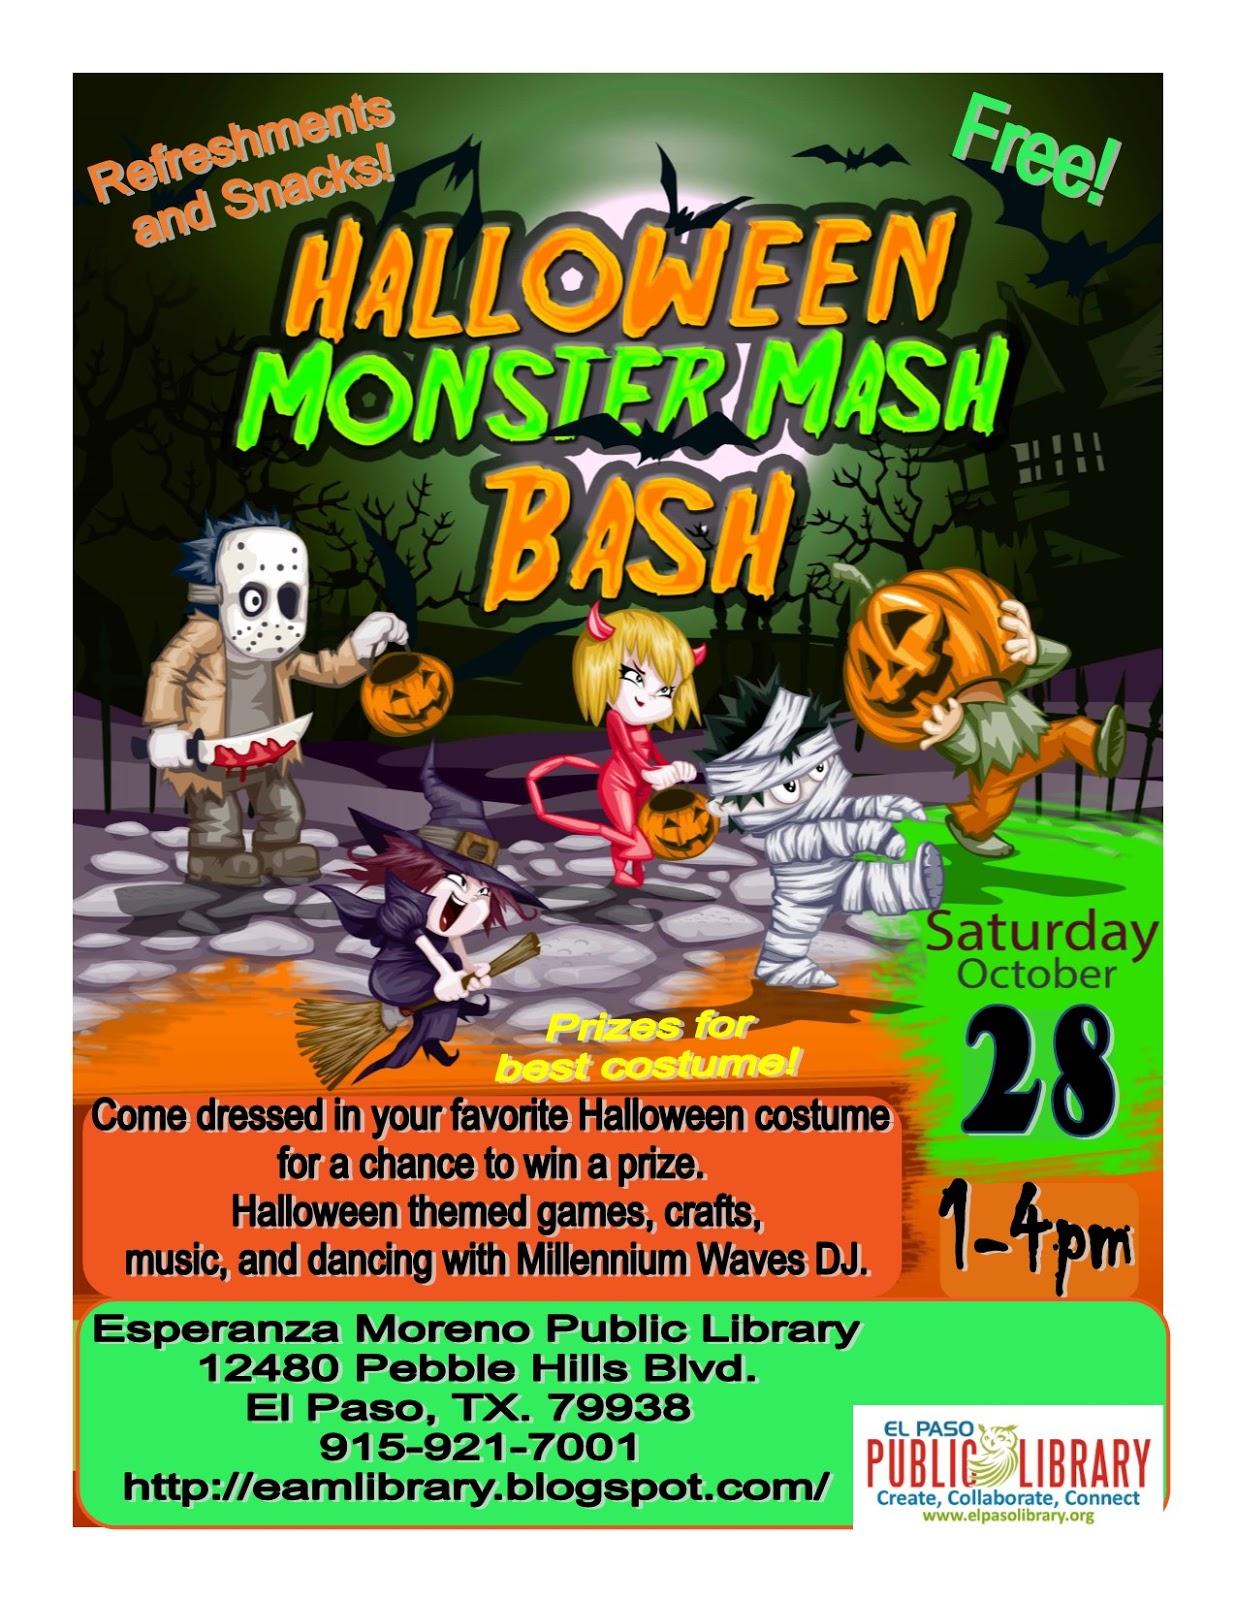 esperanza acosta moreno regional library: halloween monster mash bash